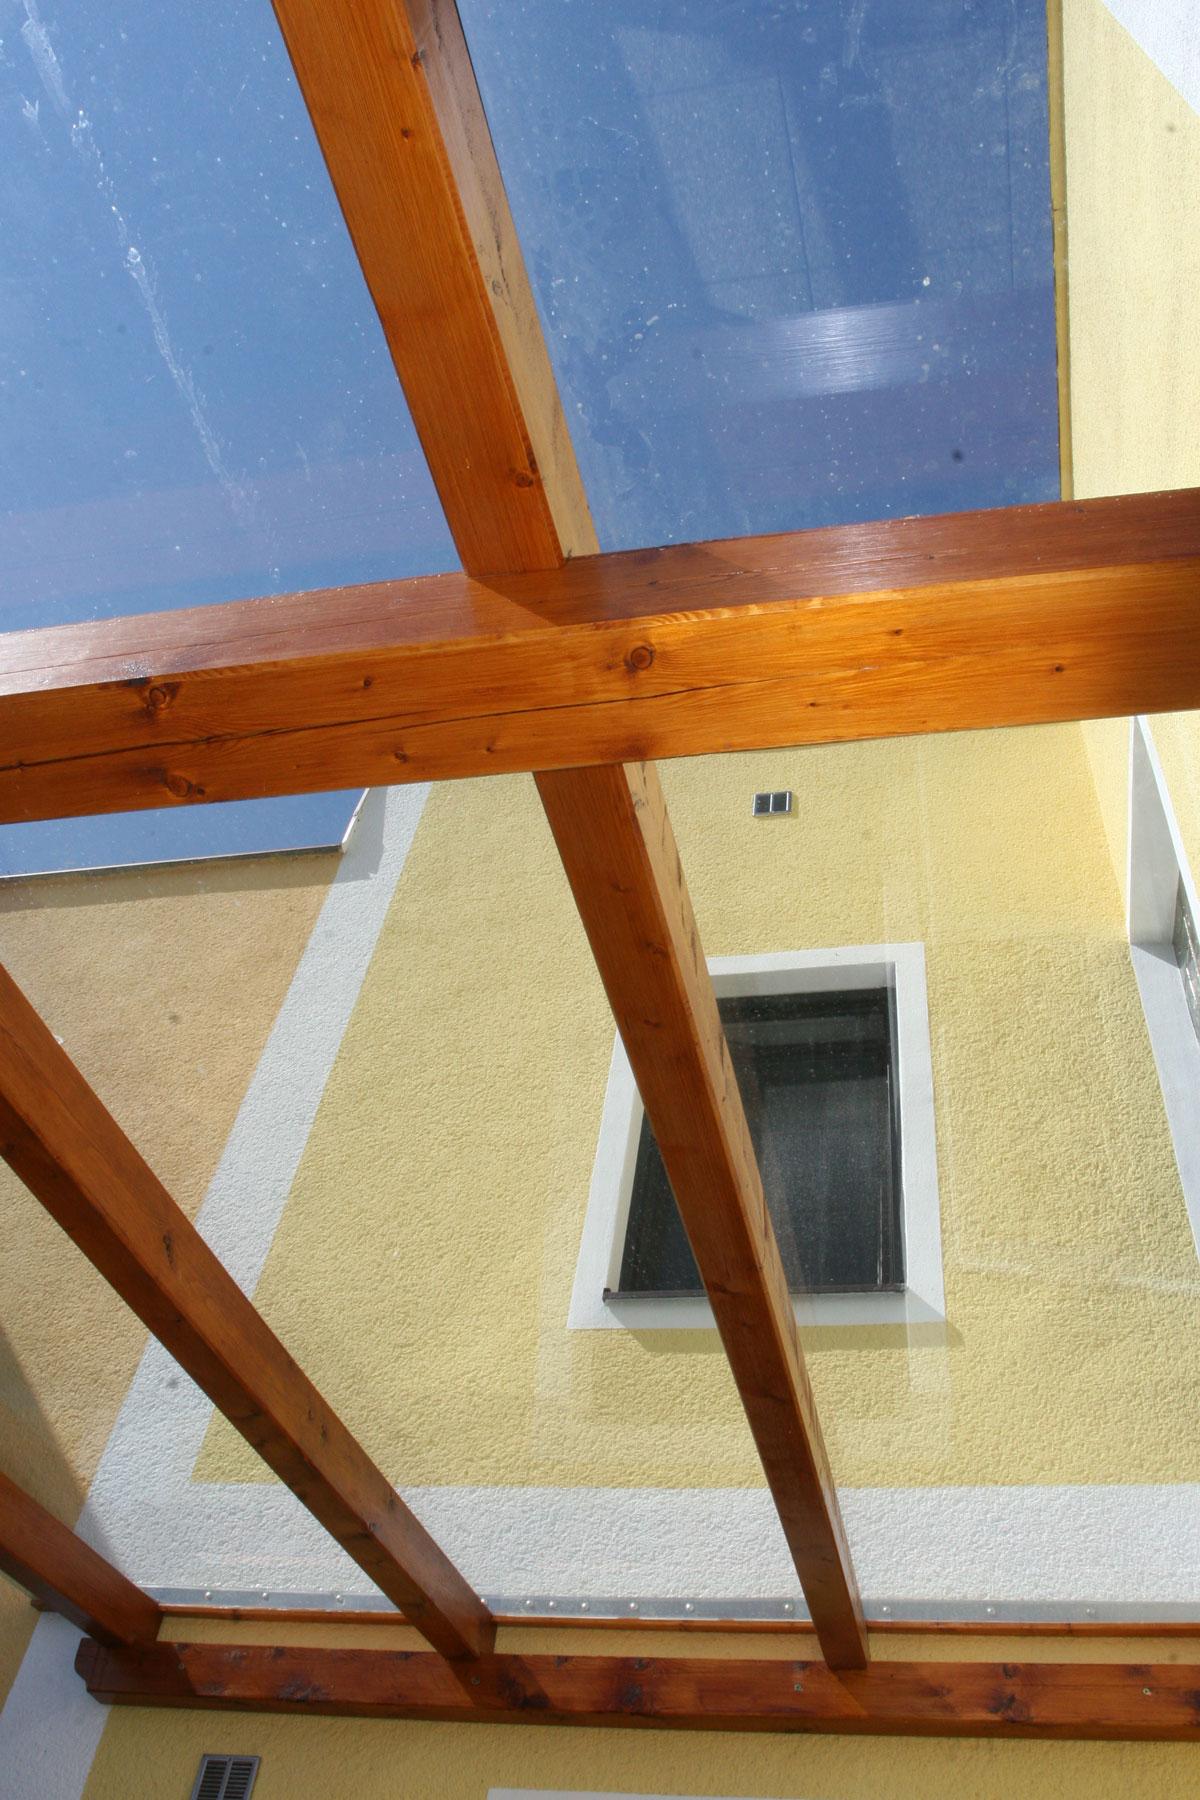 Sklenarstvi-Prerost-strechy-a- pristresky (45)